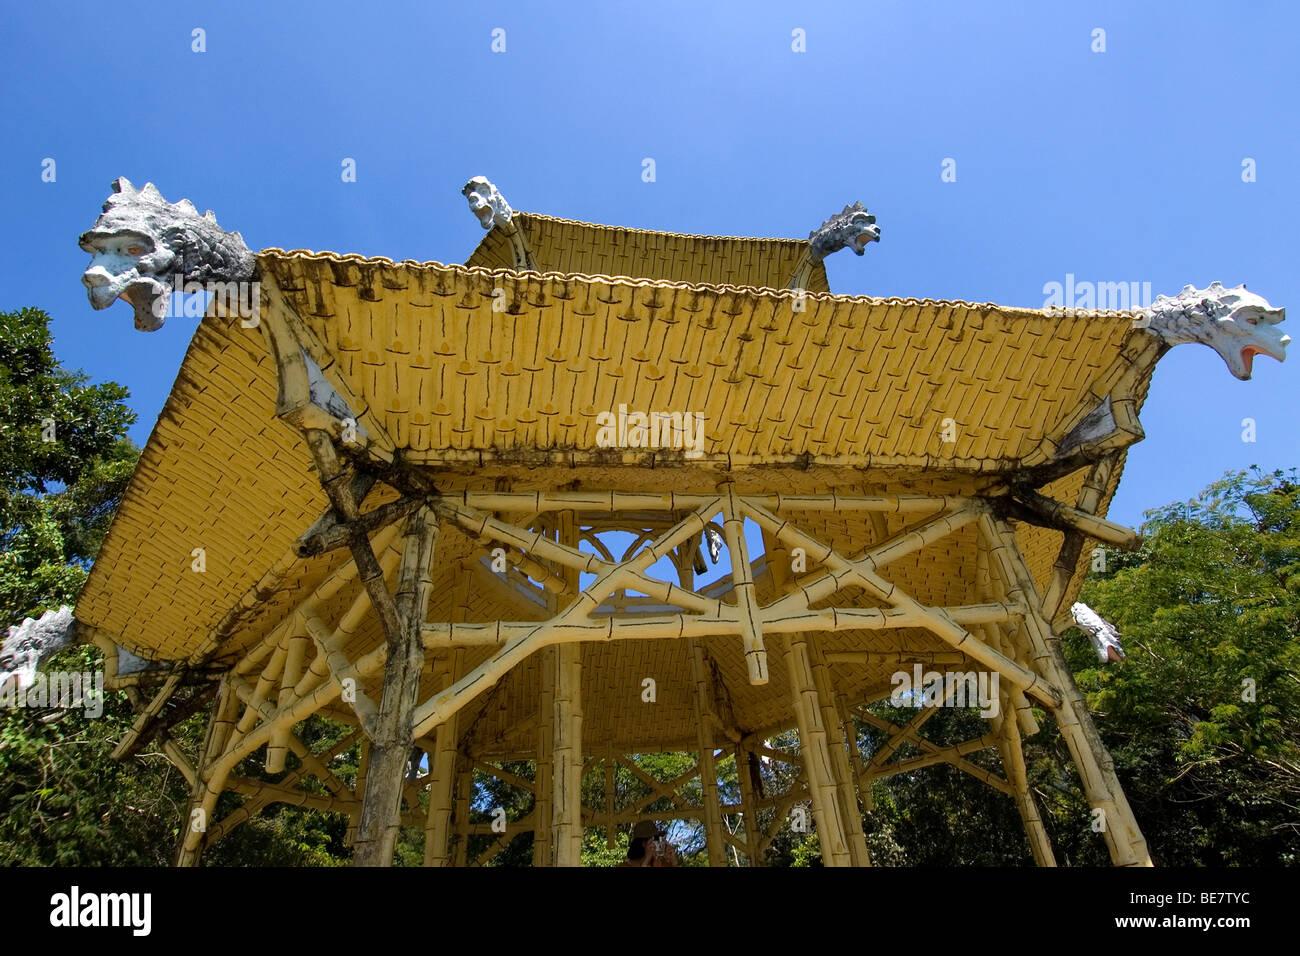 Chinese pagoda inside Tijuca National Forest Park, Rio de Janeiro, Brazil Stock Photo